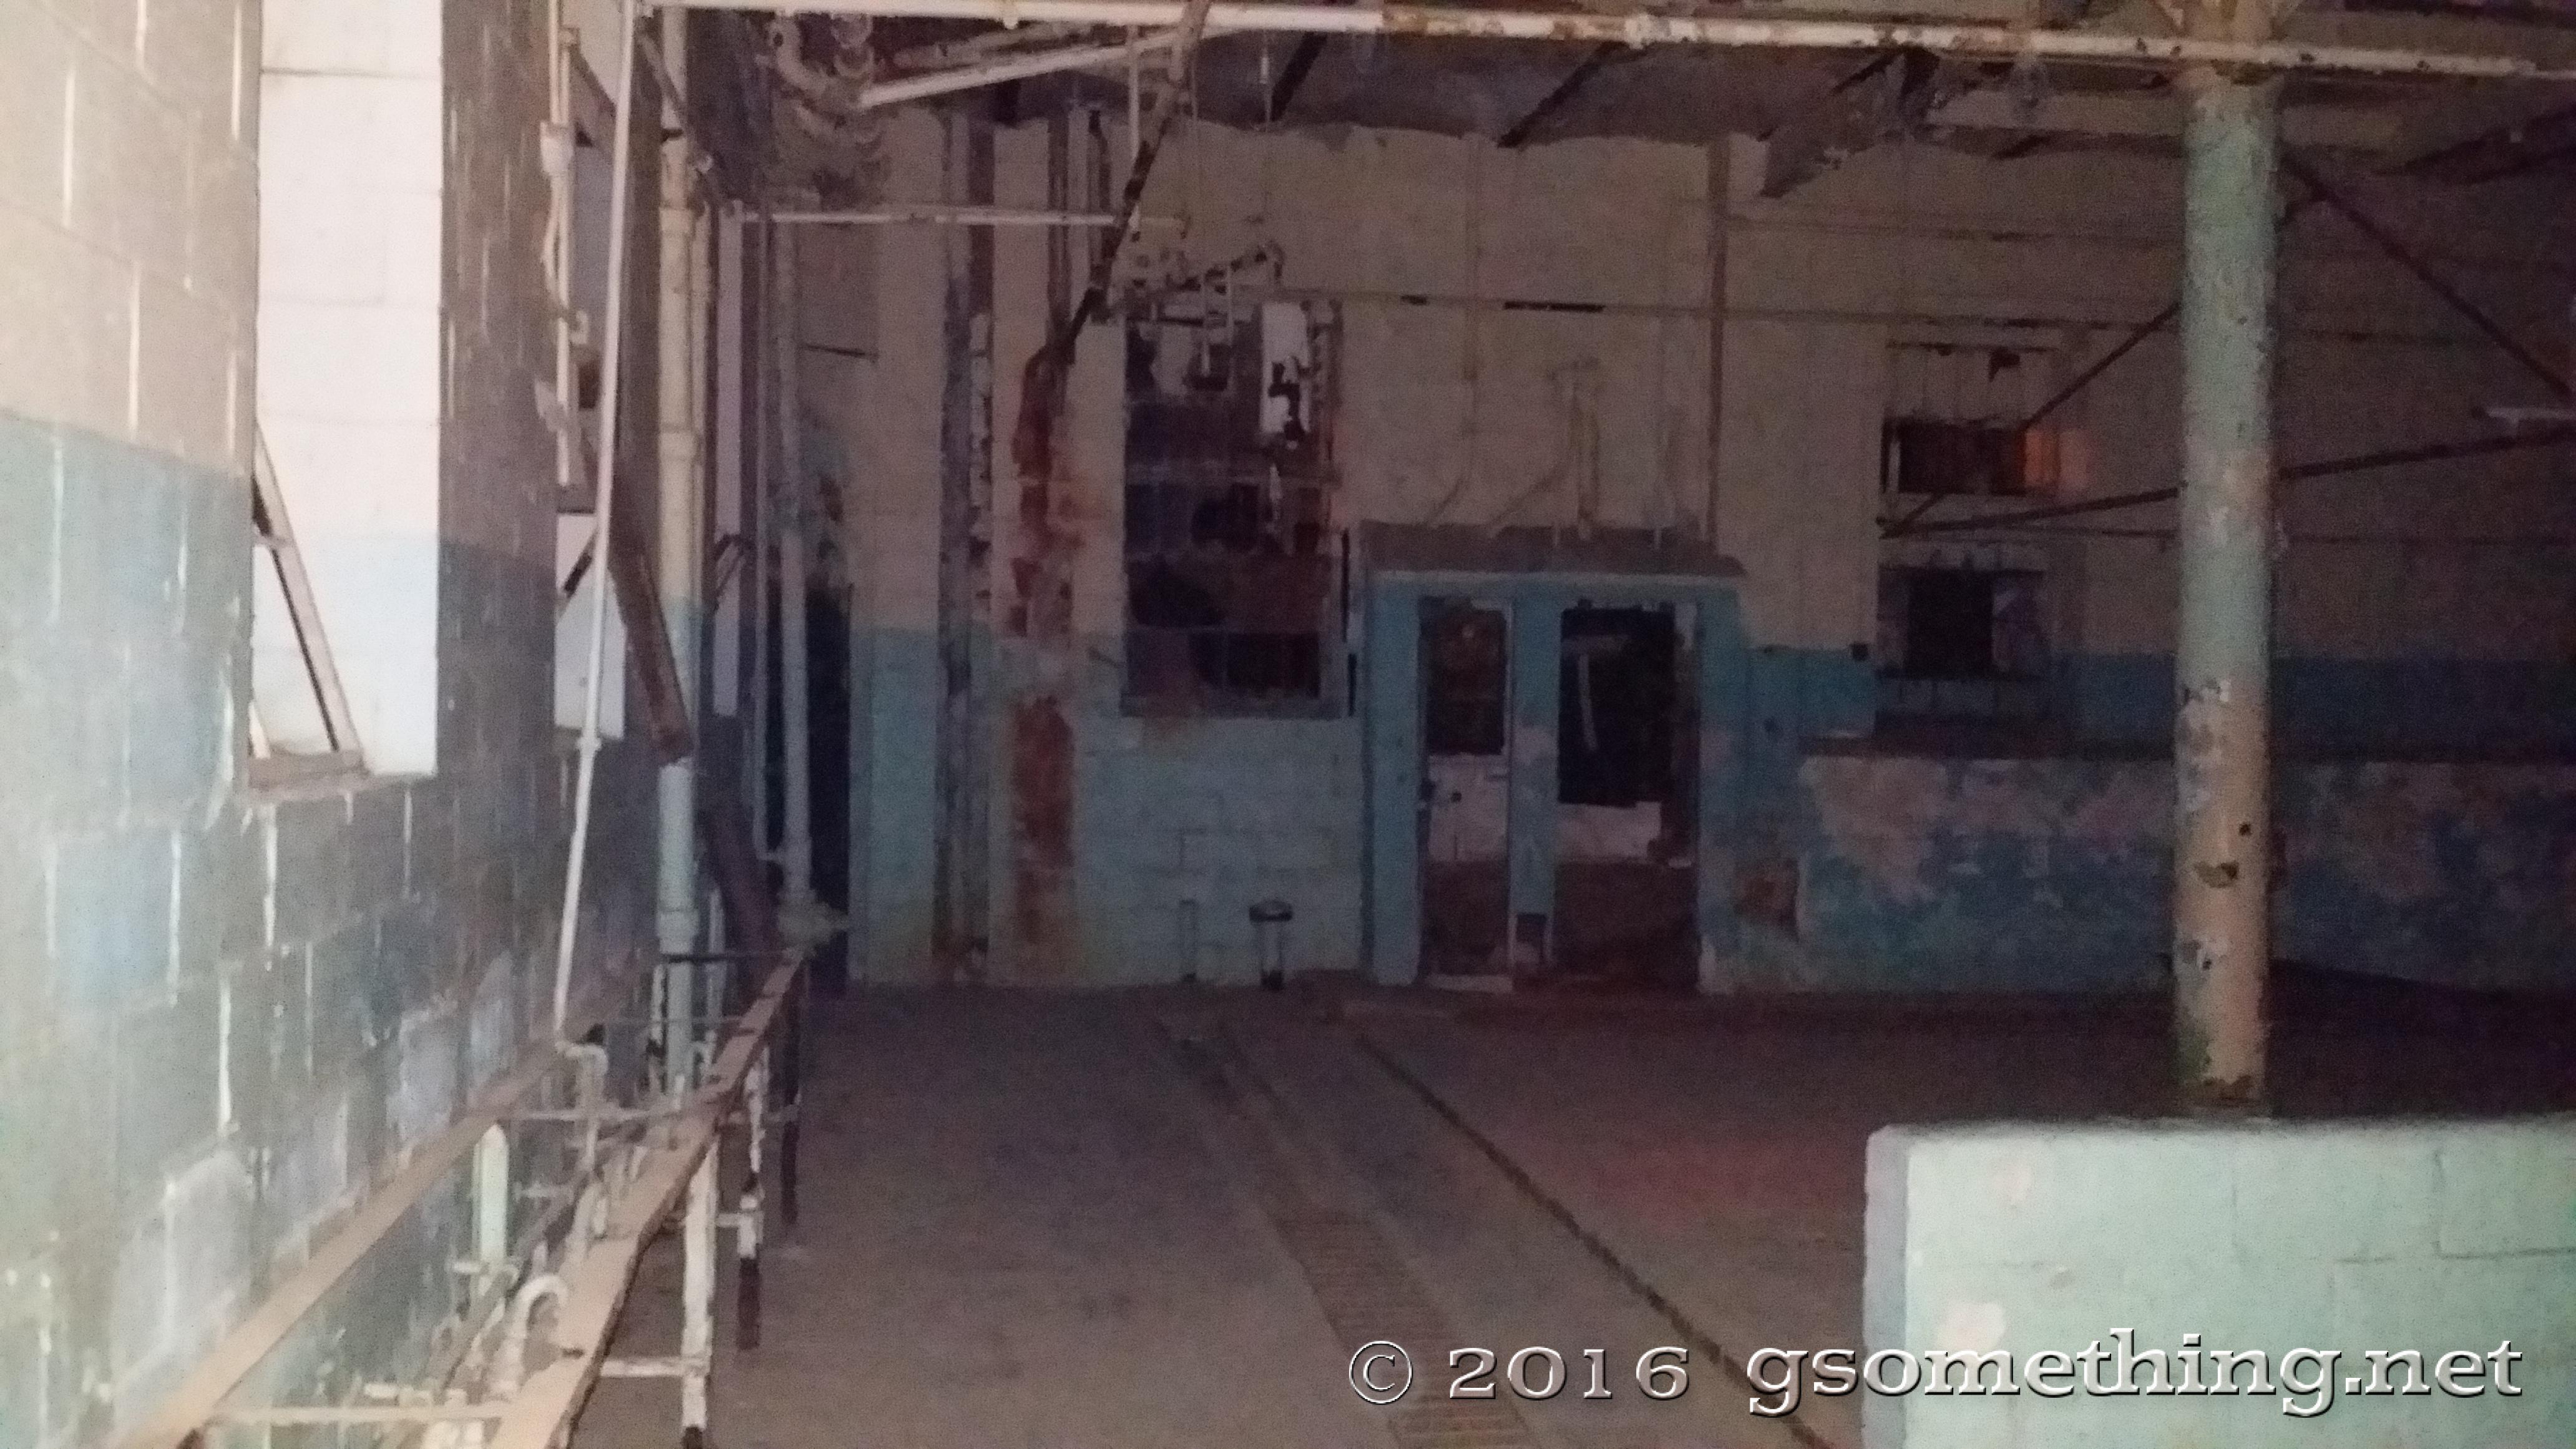 mansfield_reformatory_2nd_trip_121.jpg